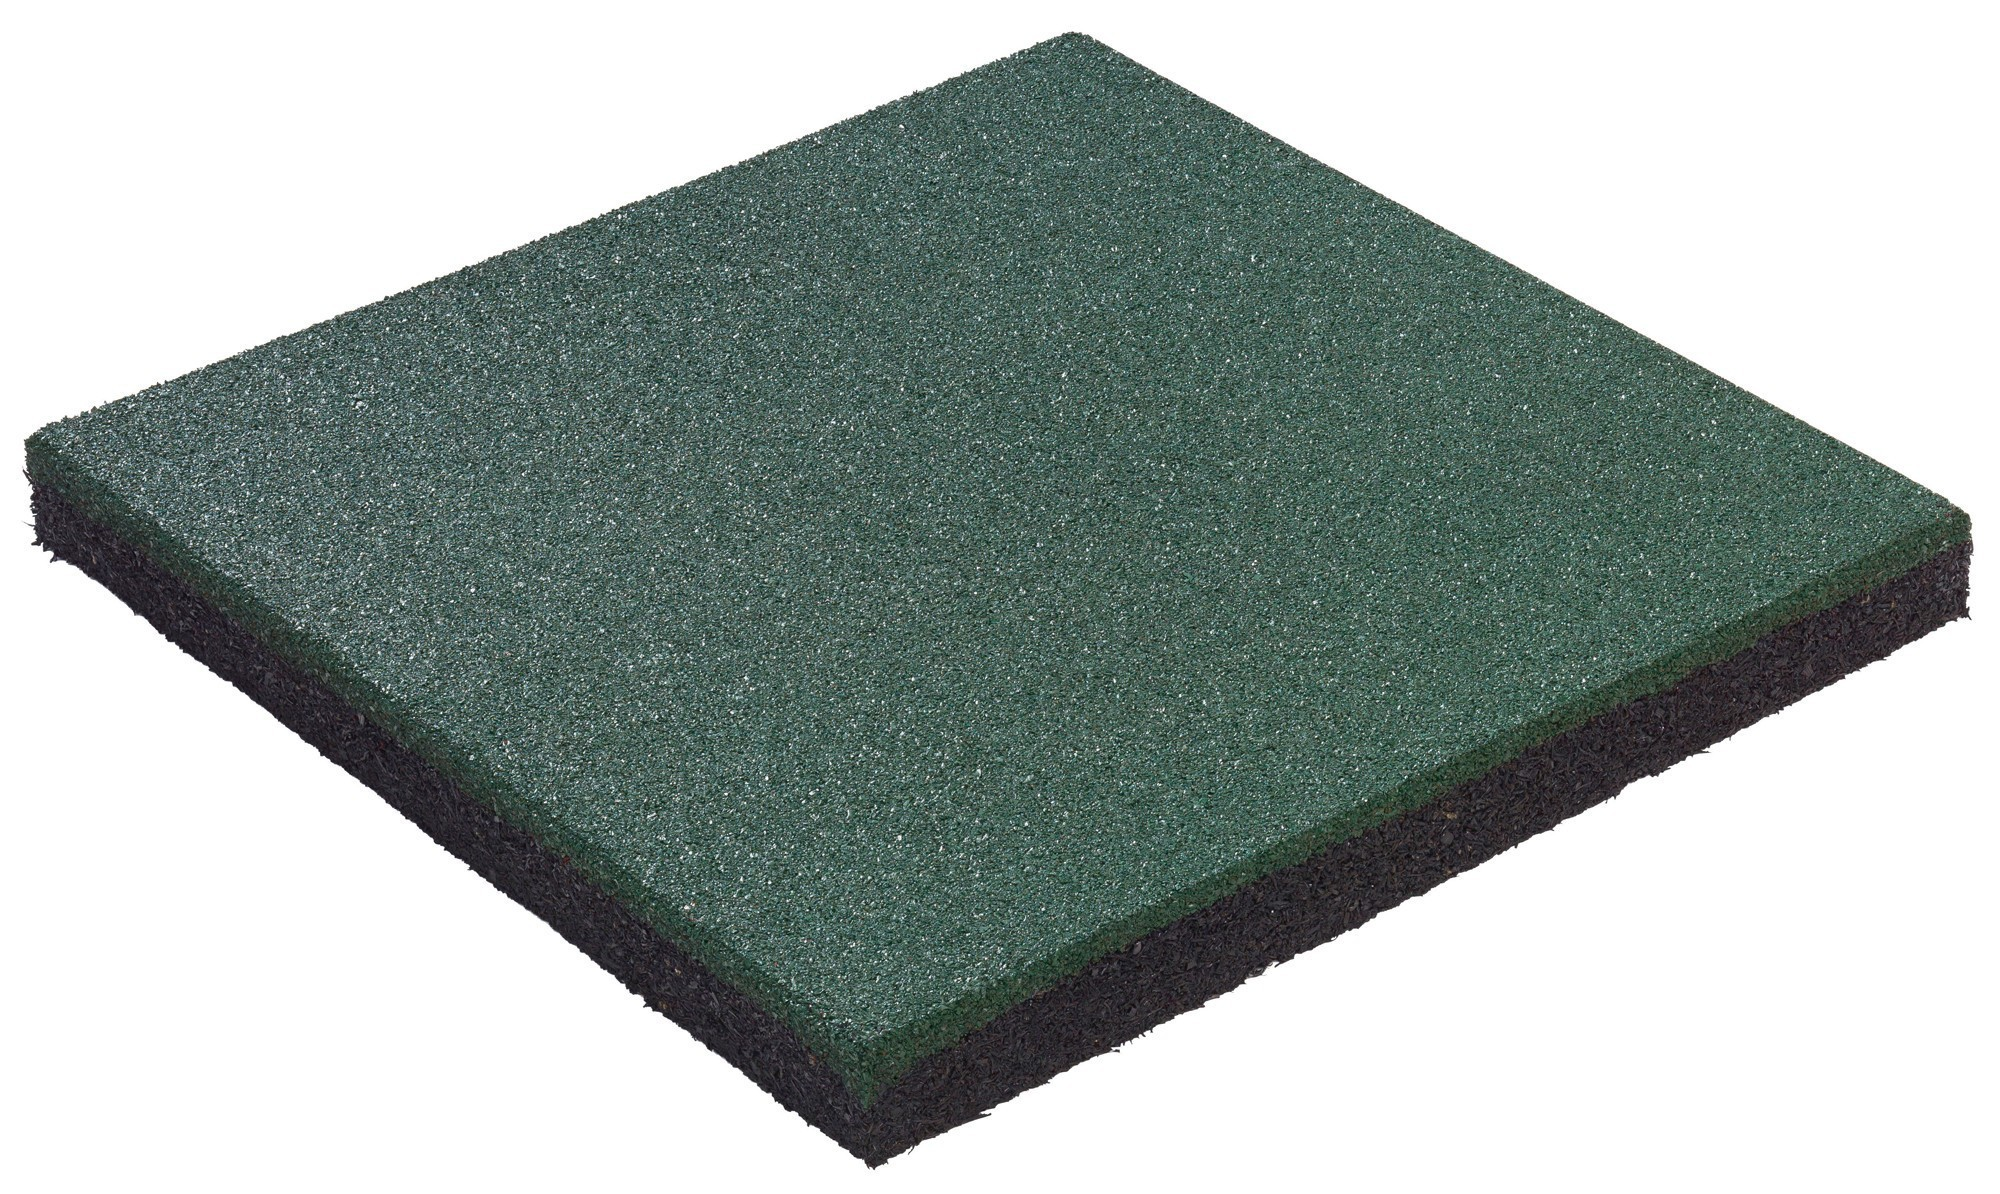 Fallschutzplatte / Gummimatte hicar 50x50x4,5cm Bild 1